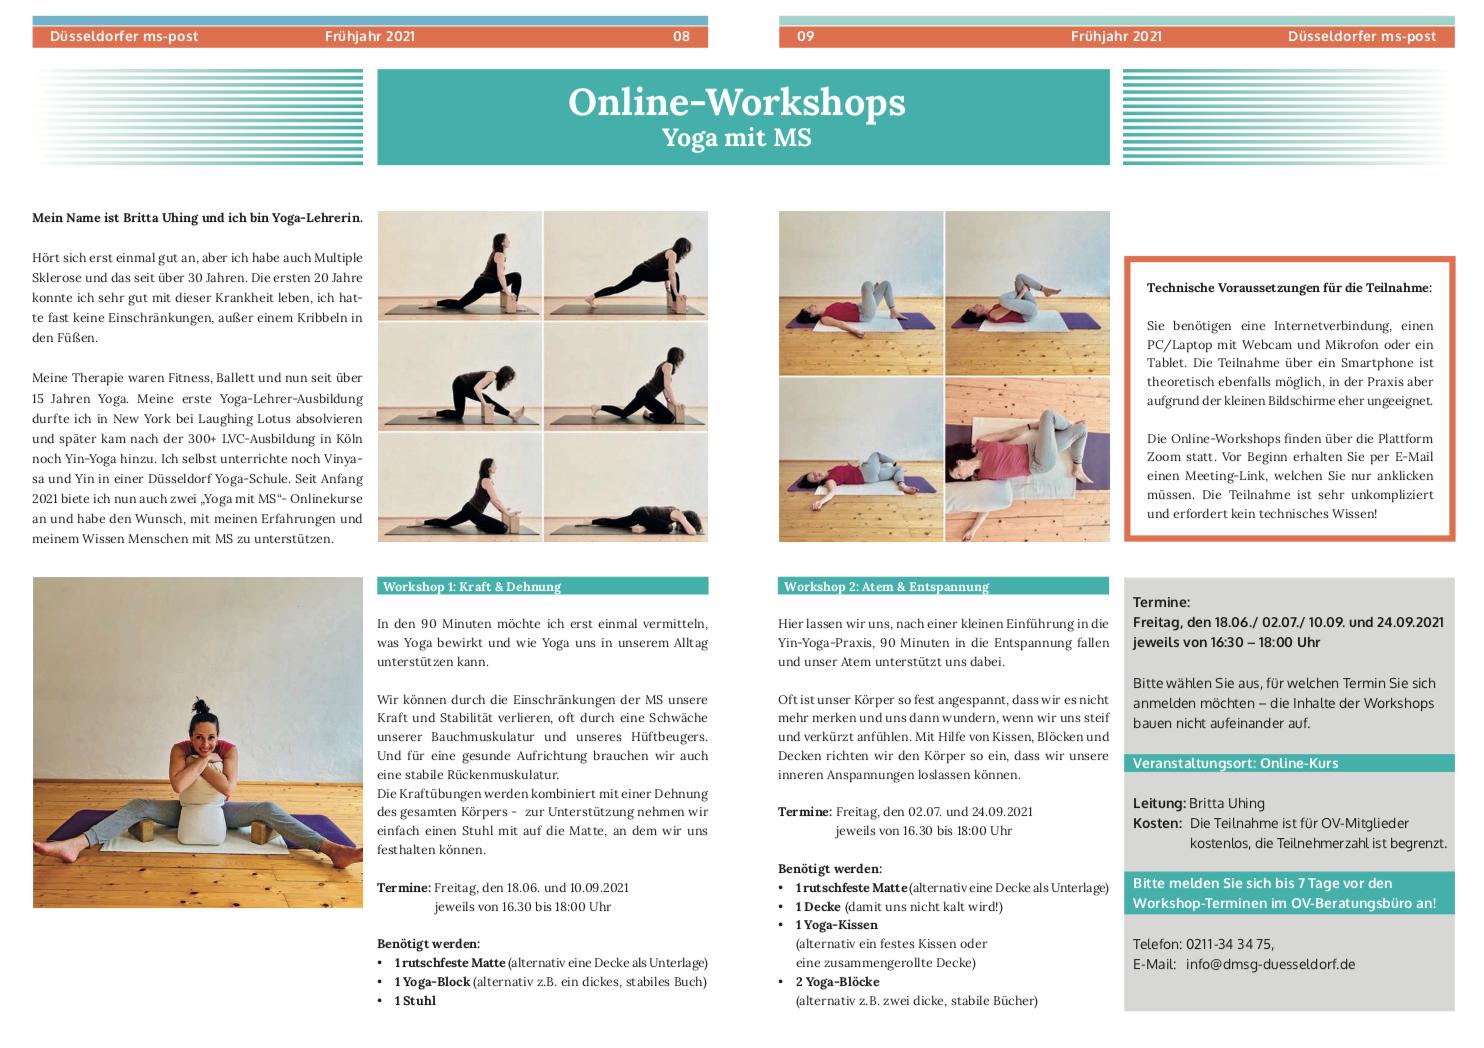 Online-Workshop der DMSG